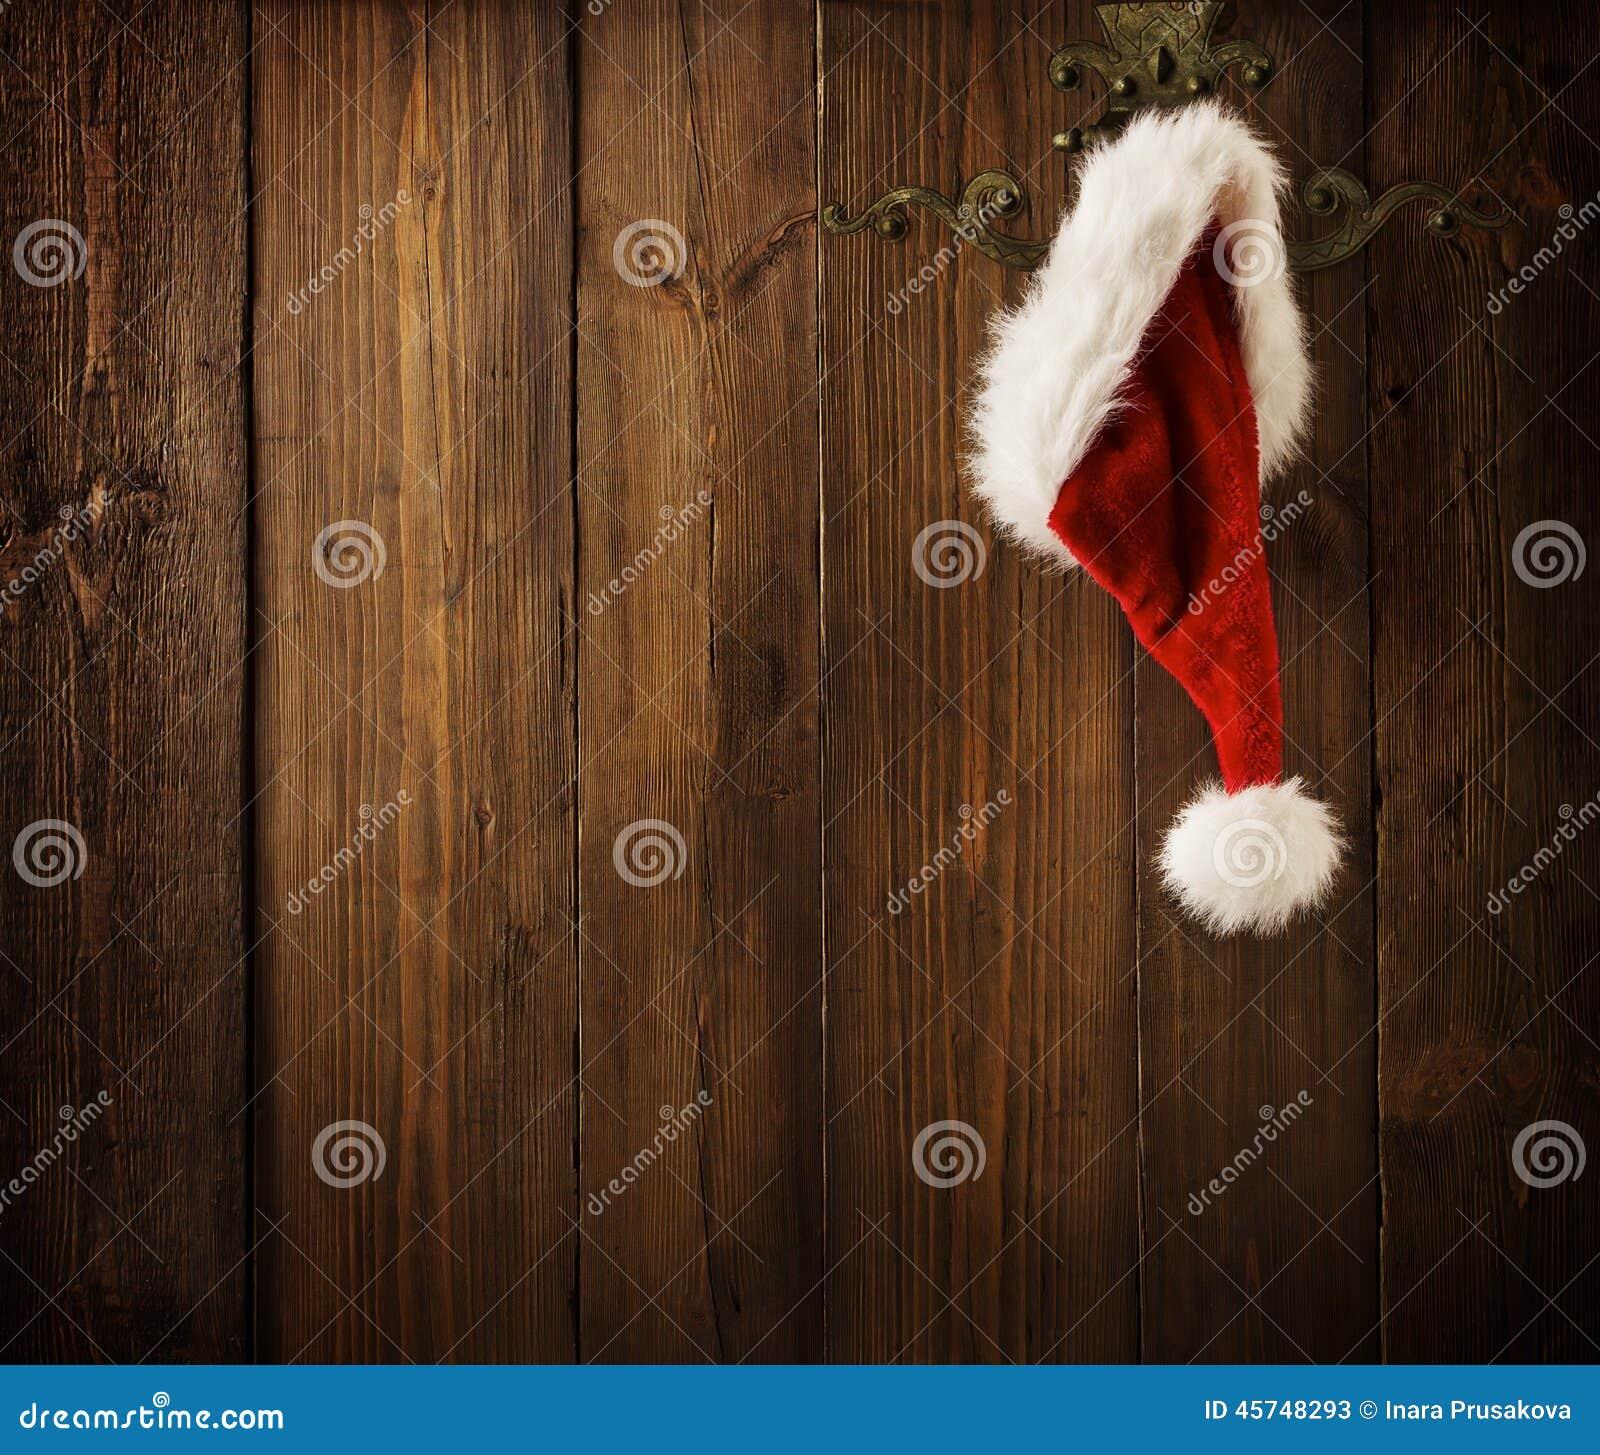 De Muur van Kerstmissanta claus hat hanging on wood, Kerstmisconcept